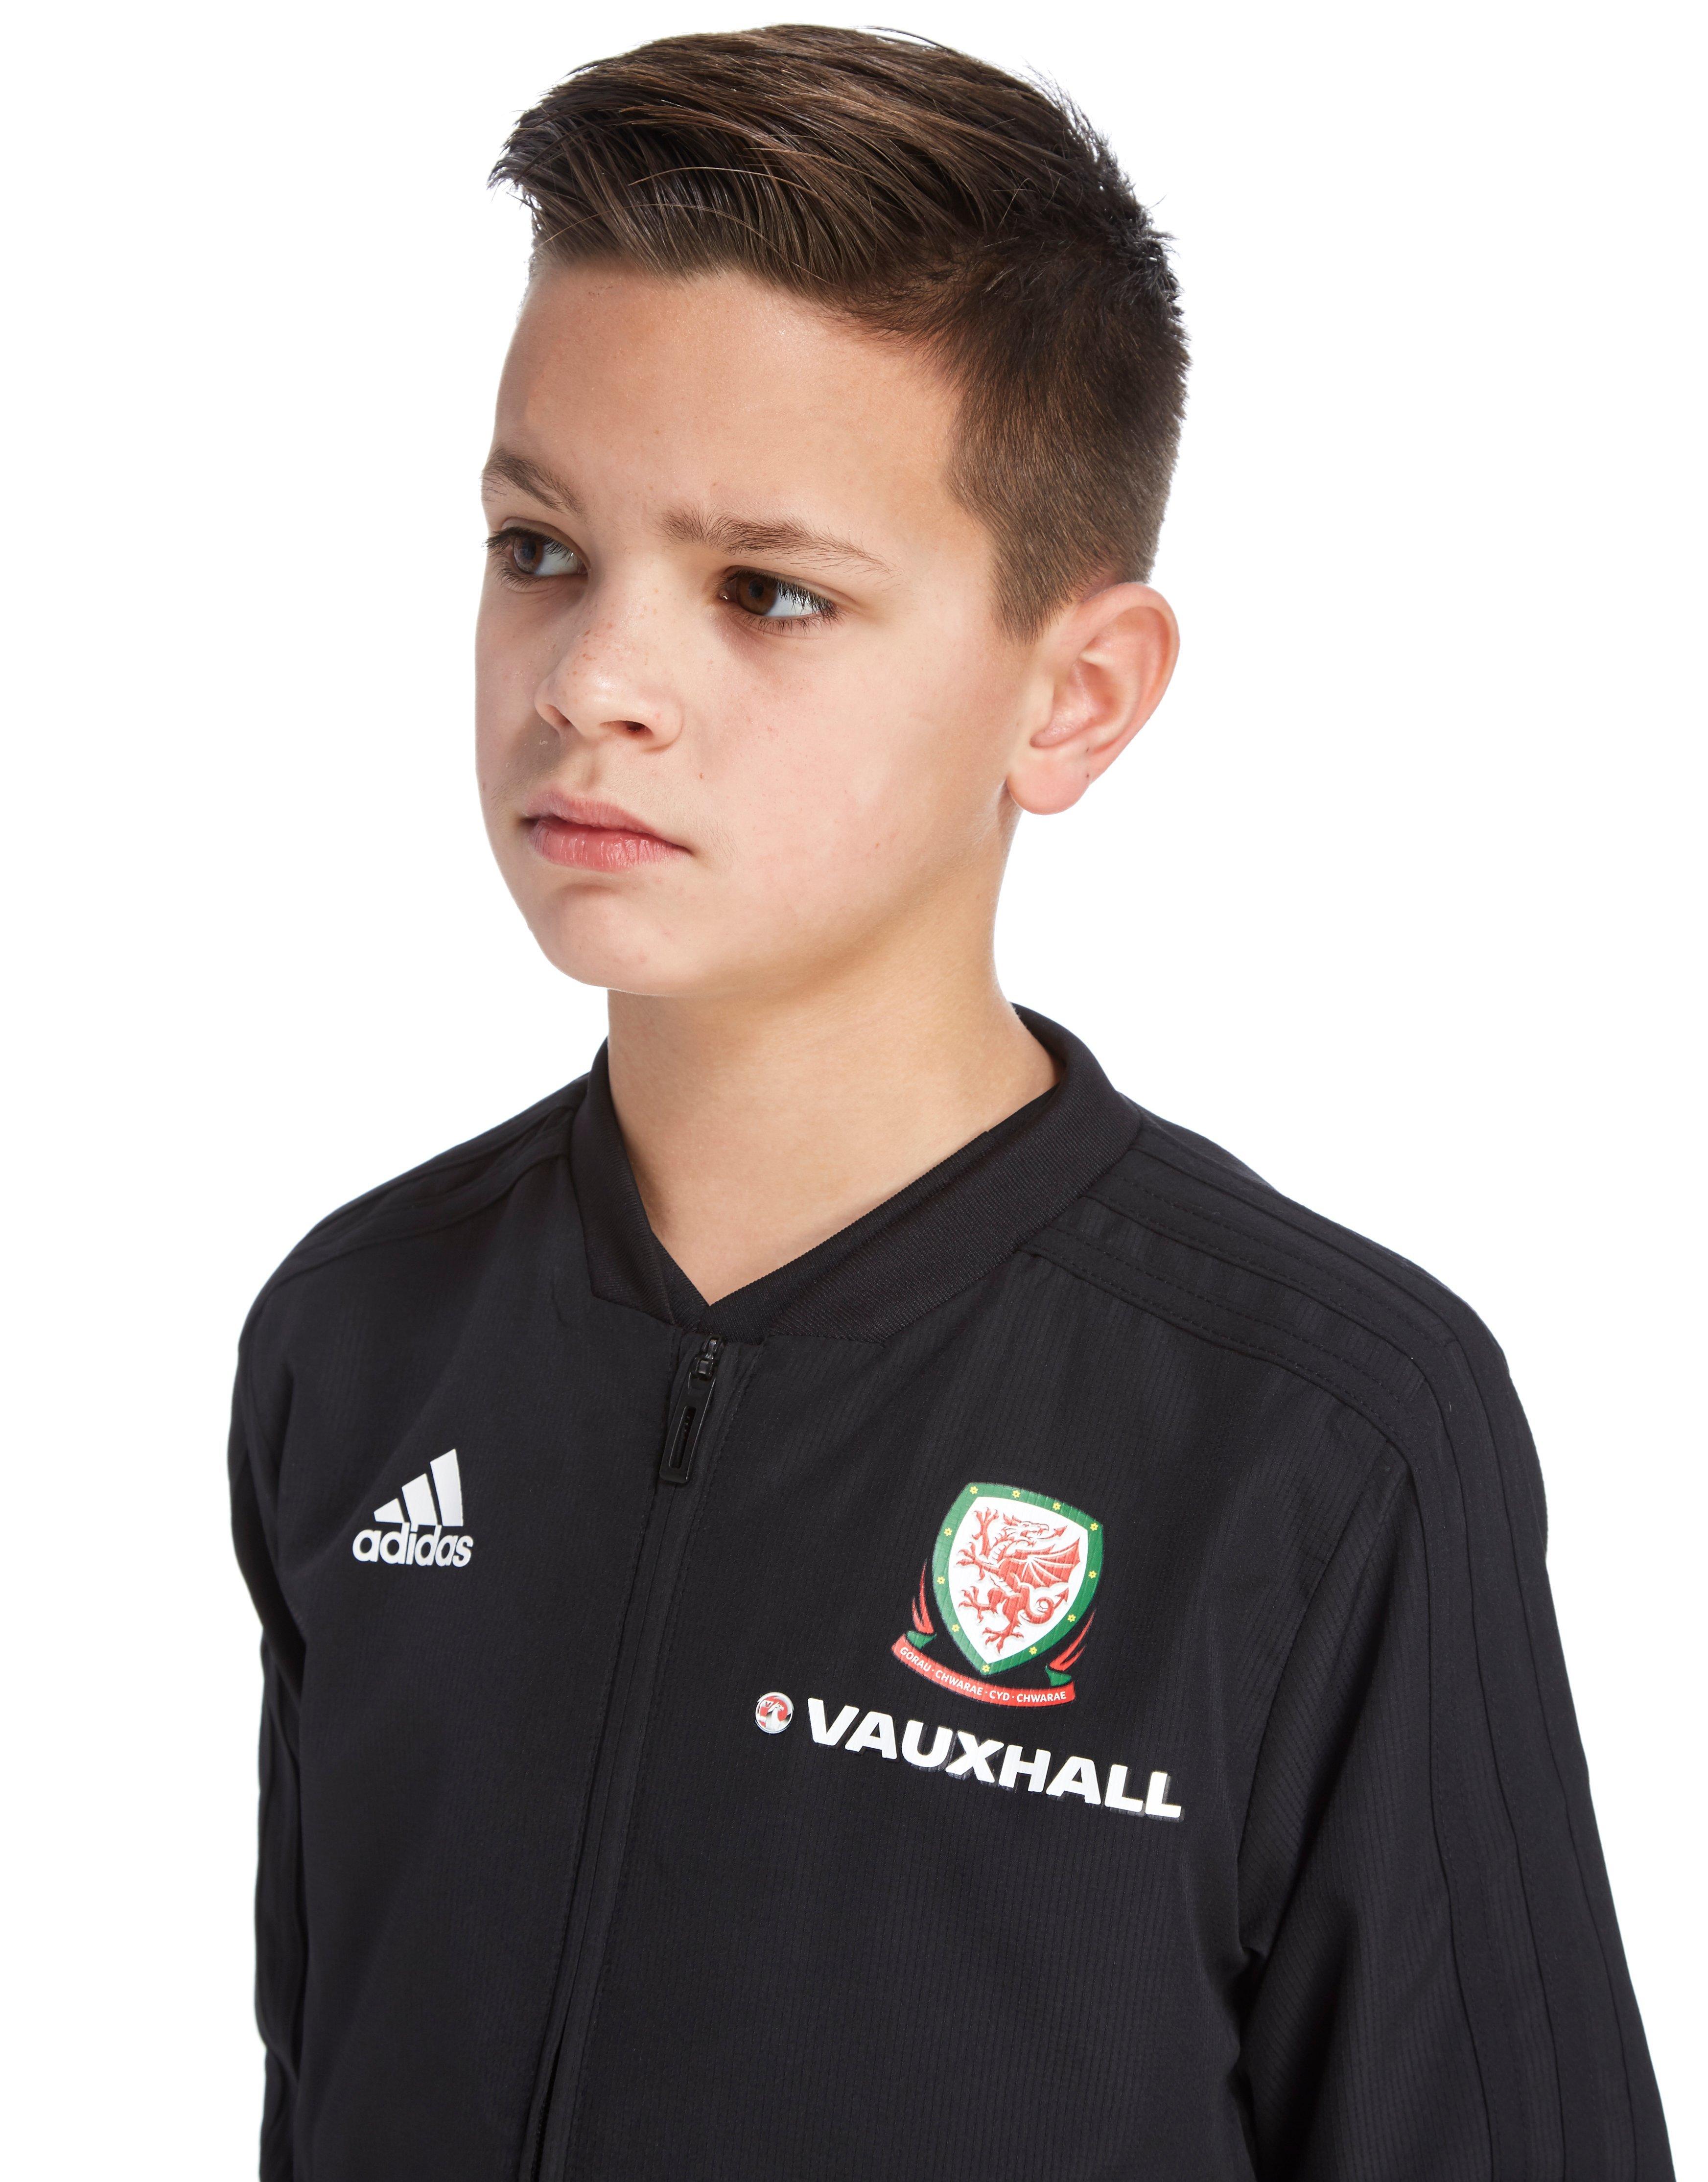 adidas FA Wales 2018/19 Presentation Jacket Junior